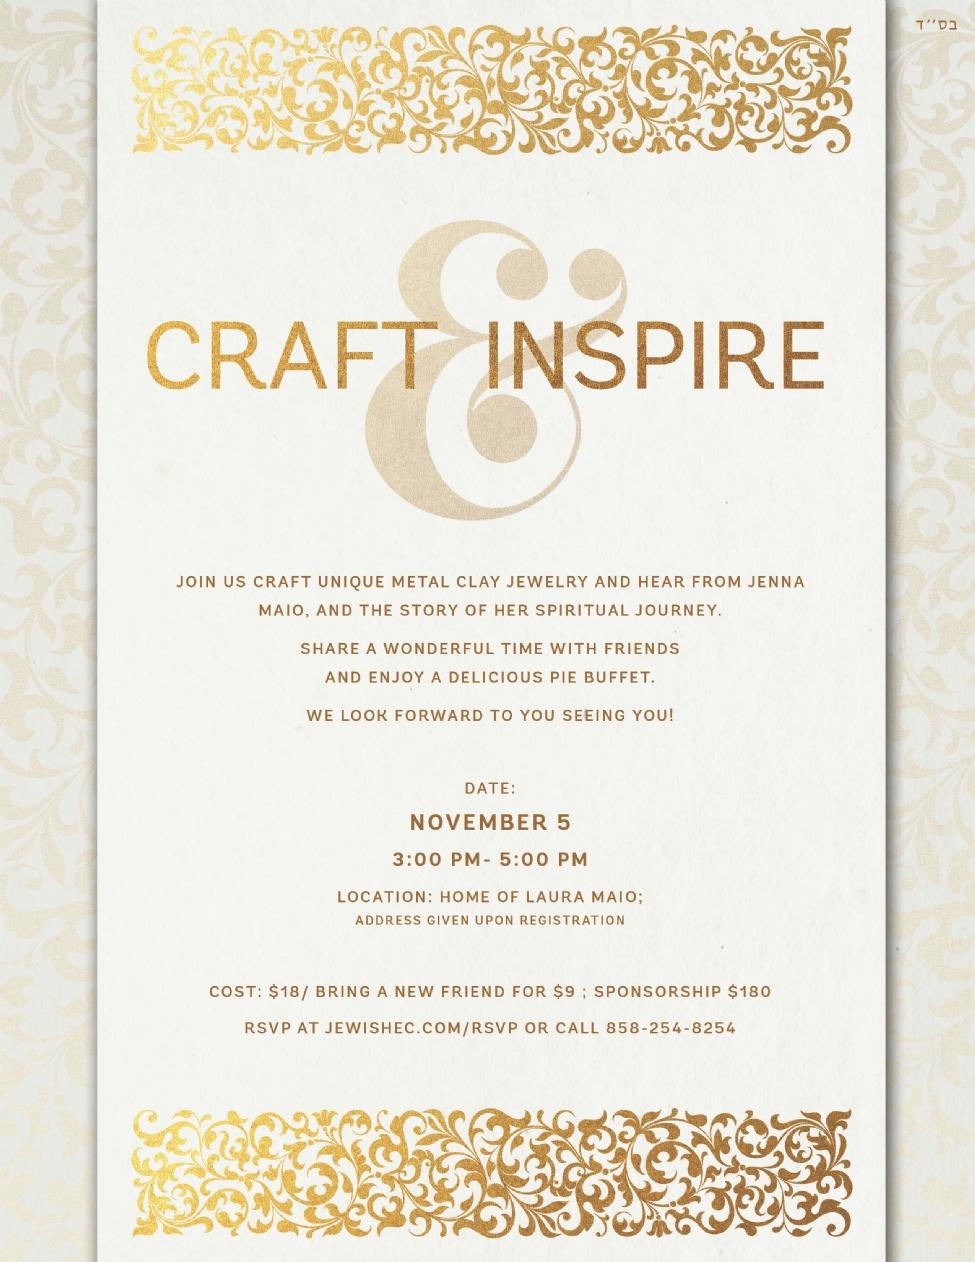 Craft&inspire.jpg